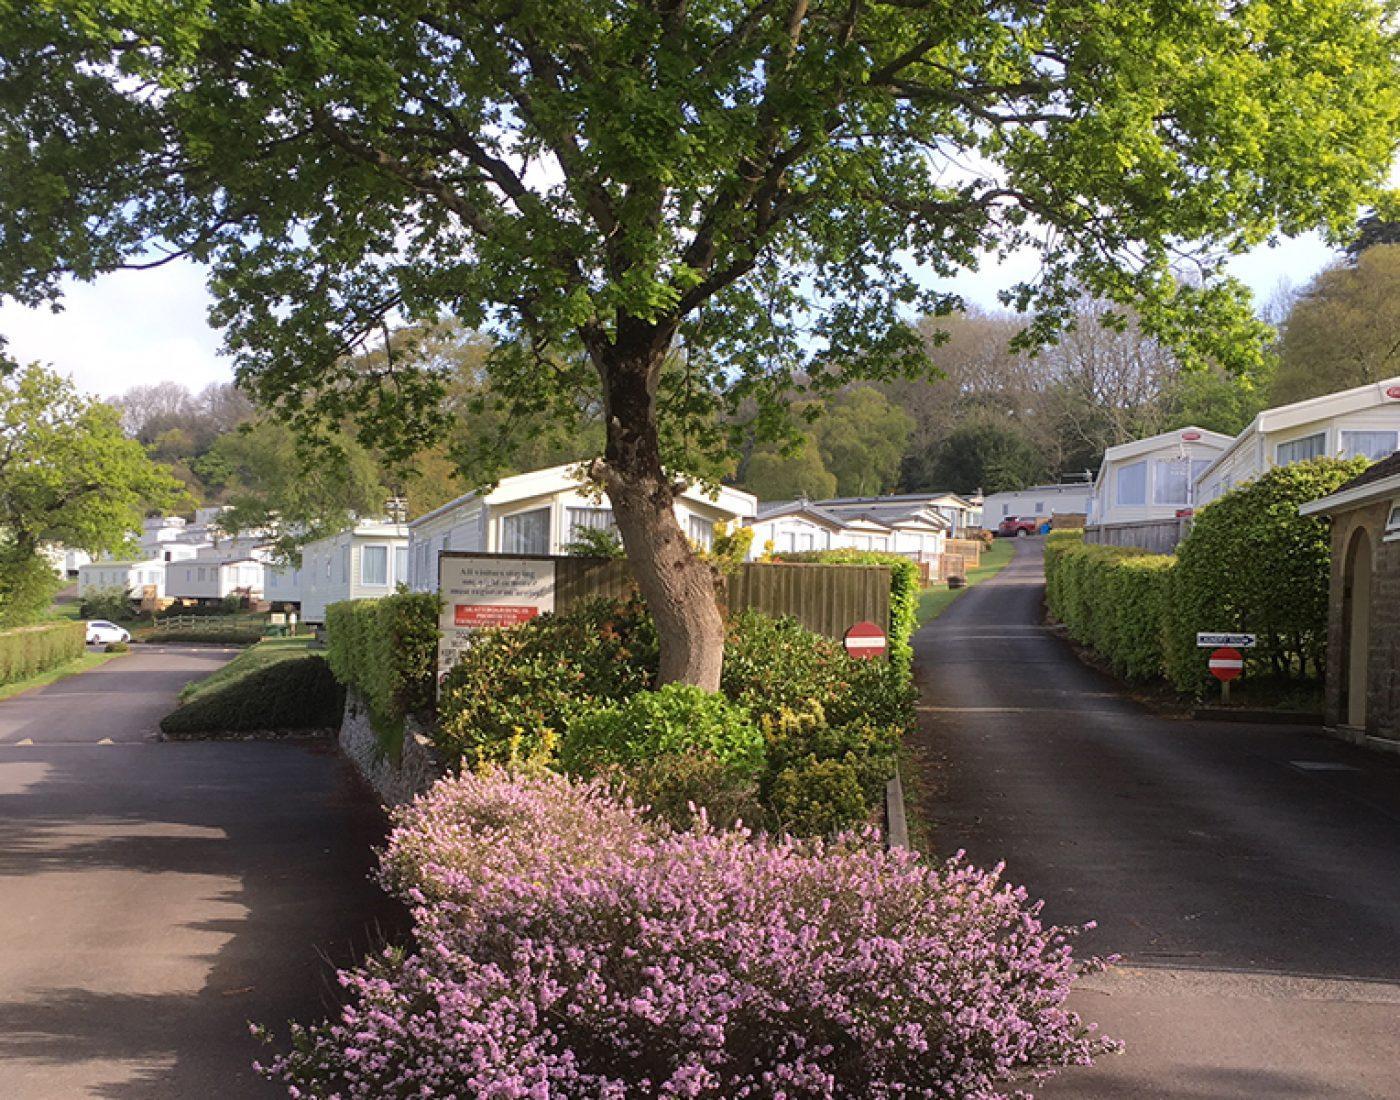 Timber-Vale-Slider-Image-Lyme-Regis-Caravan-Park-Campsite-Dorset-Jurassic-Coast-Dorset-Campsite-4